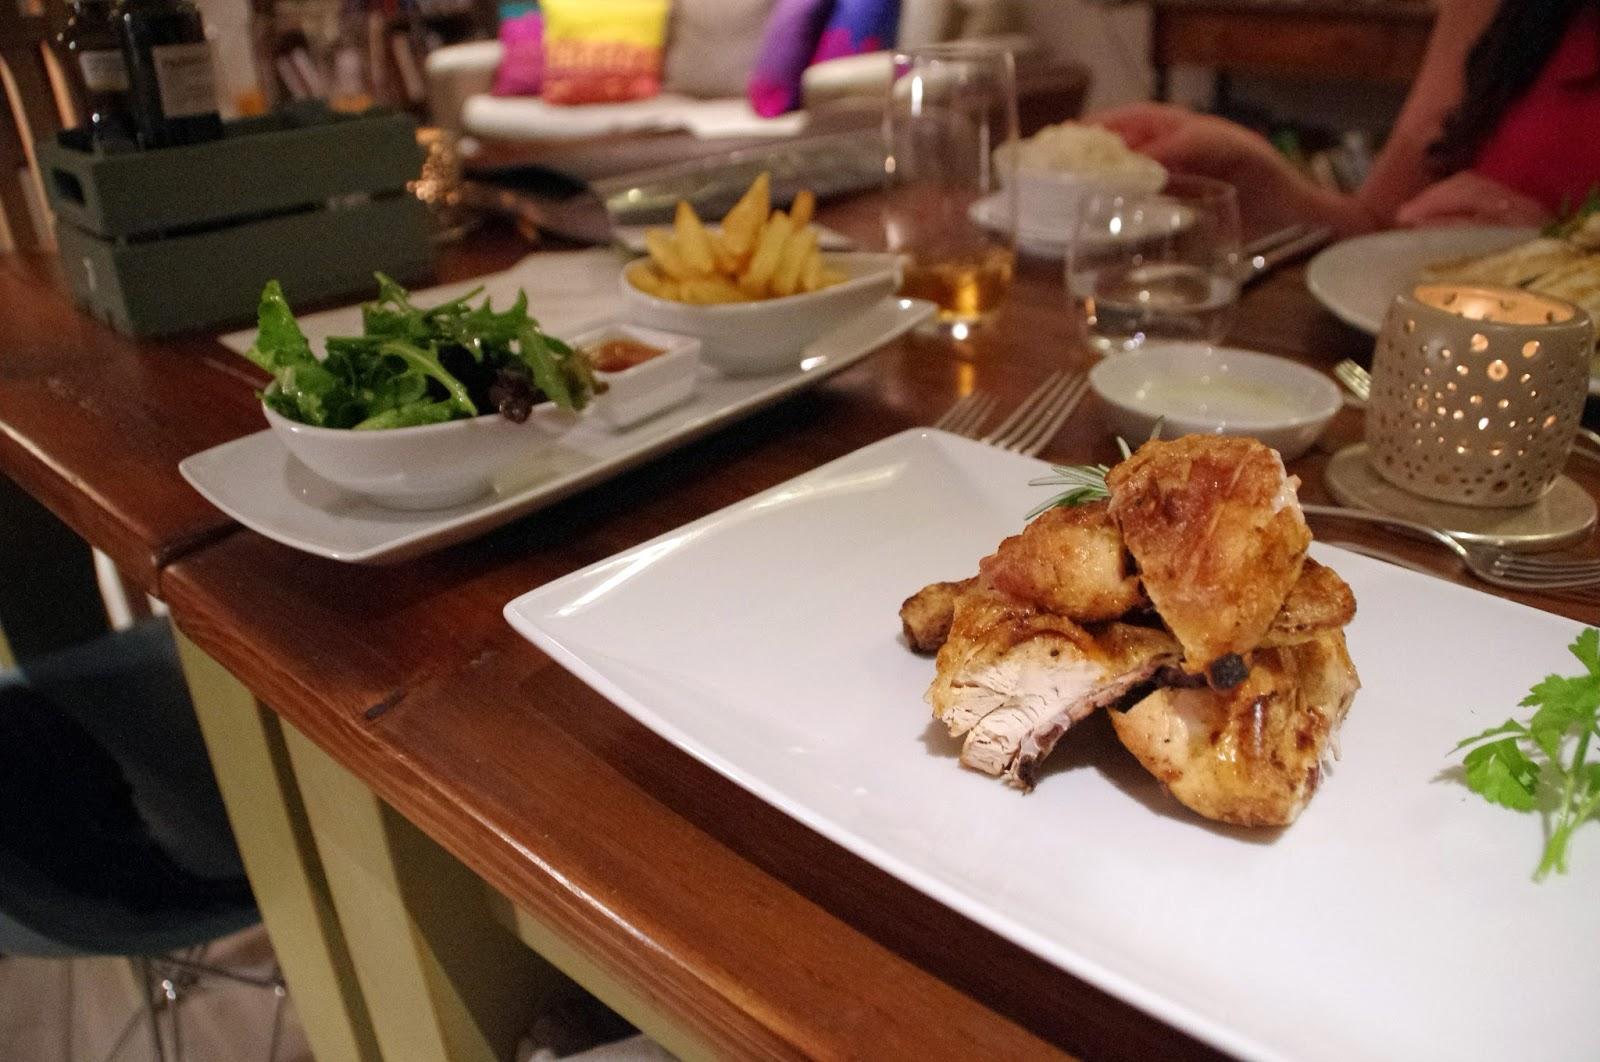 Chicken dinner at Fazenda Nova Country House